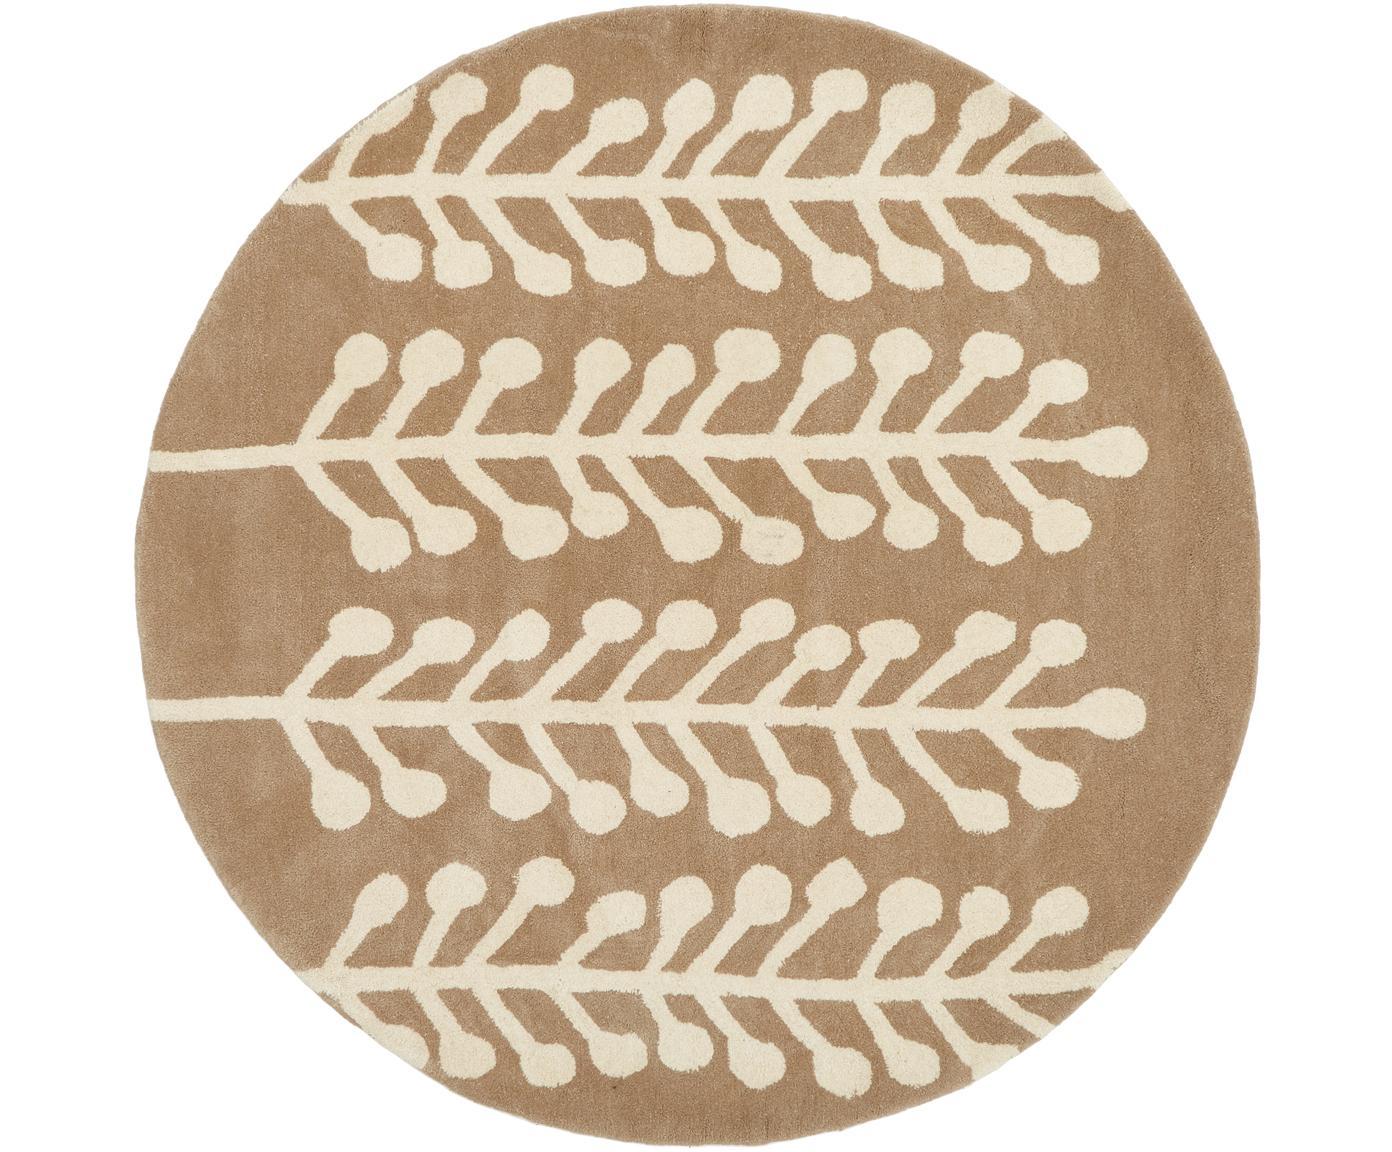 Alfombra redonda de lana Wool Herbs, Parte superior: lana, Reverso: algodón, Bayo, crema, Ø 200 cm (Tamaño L)